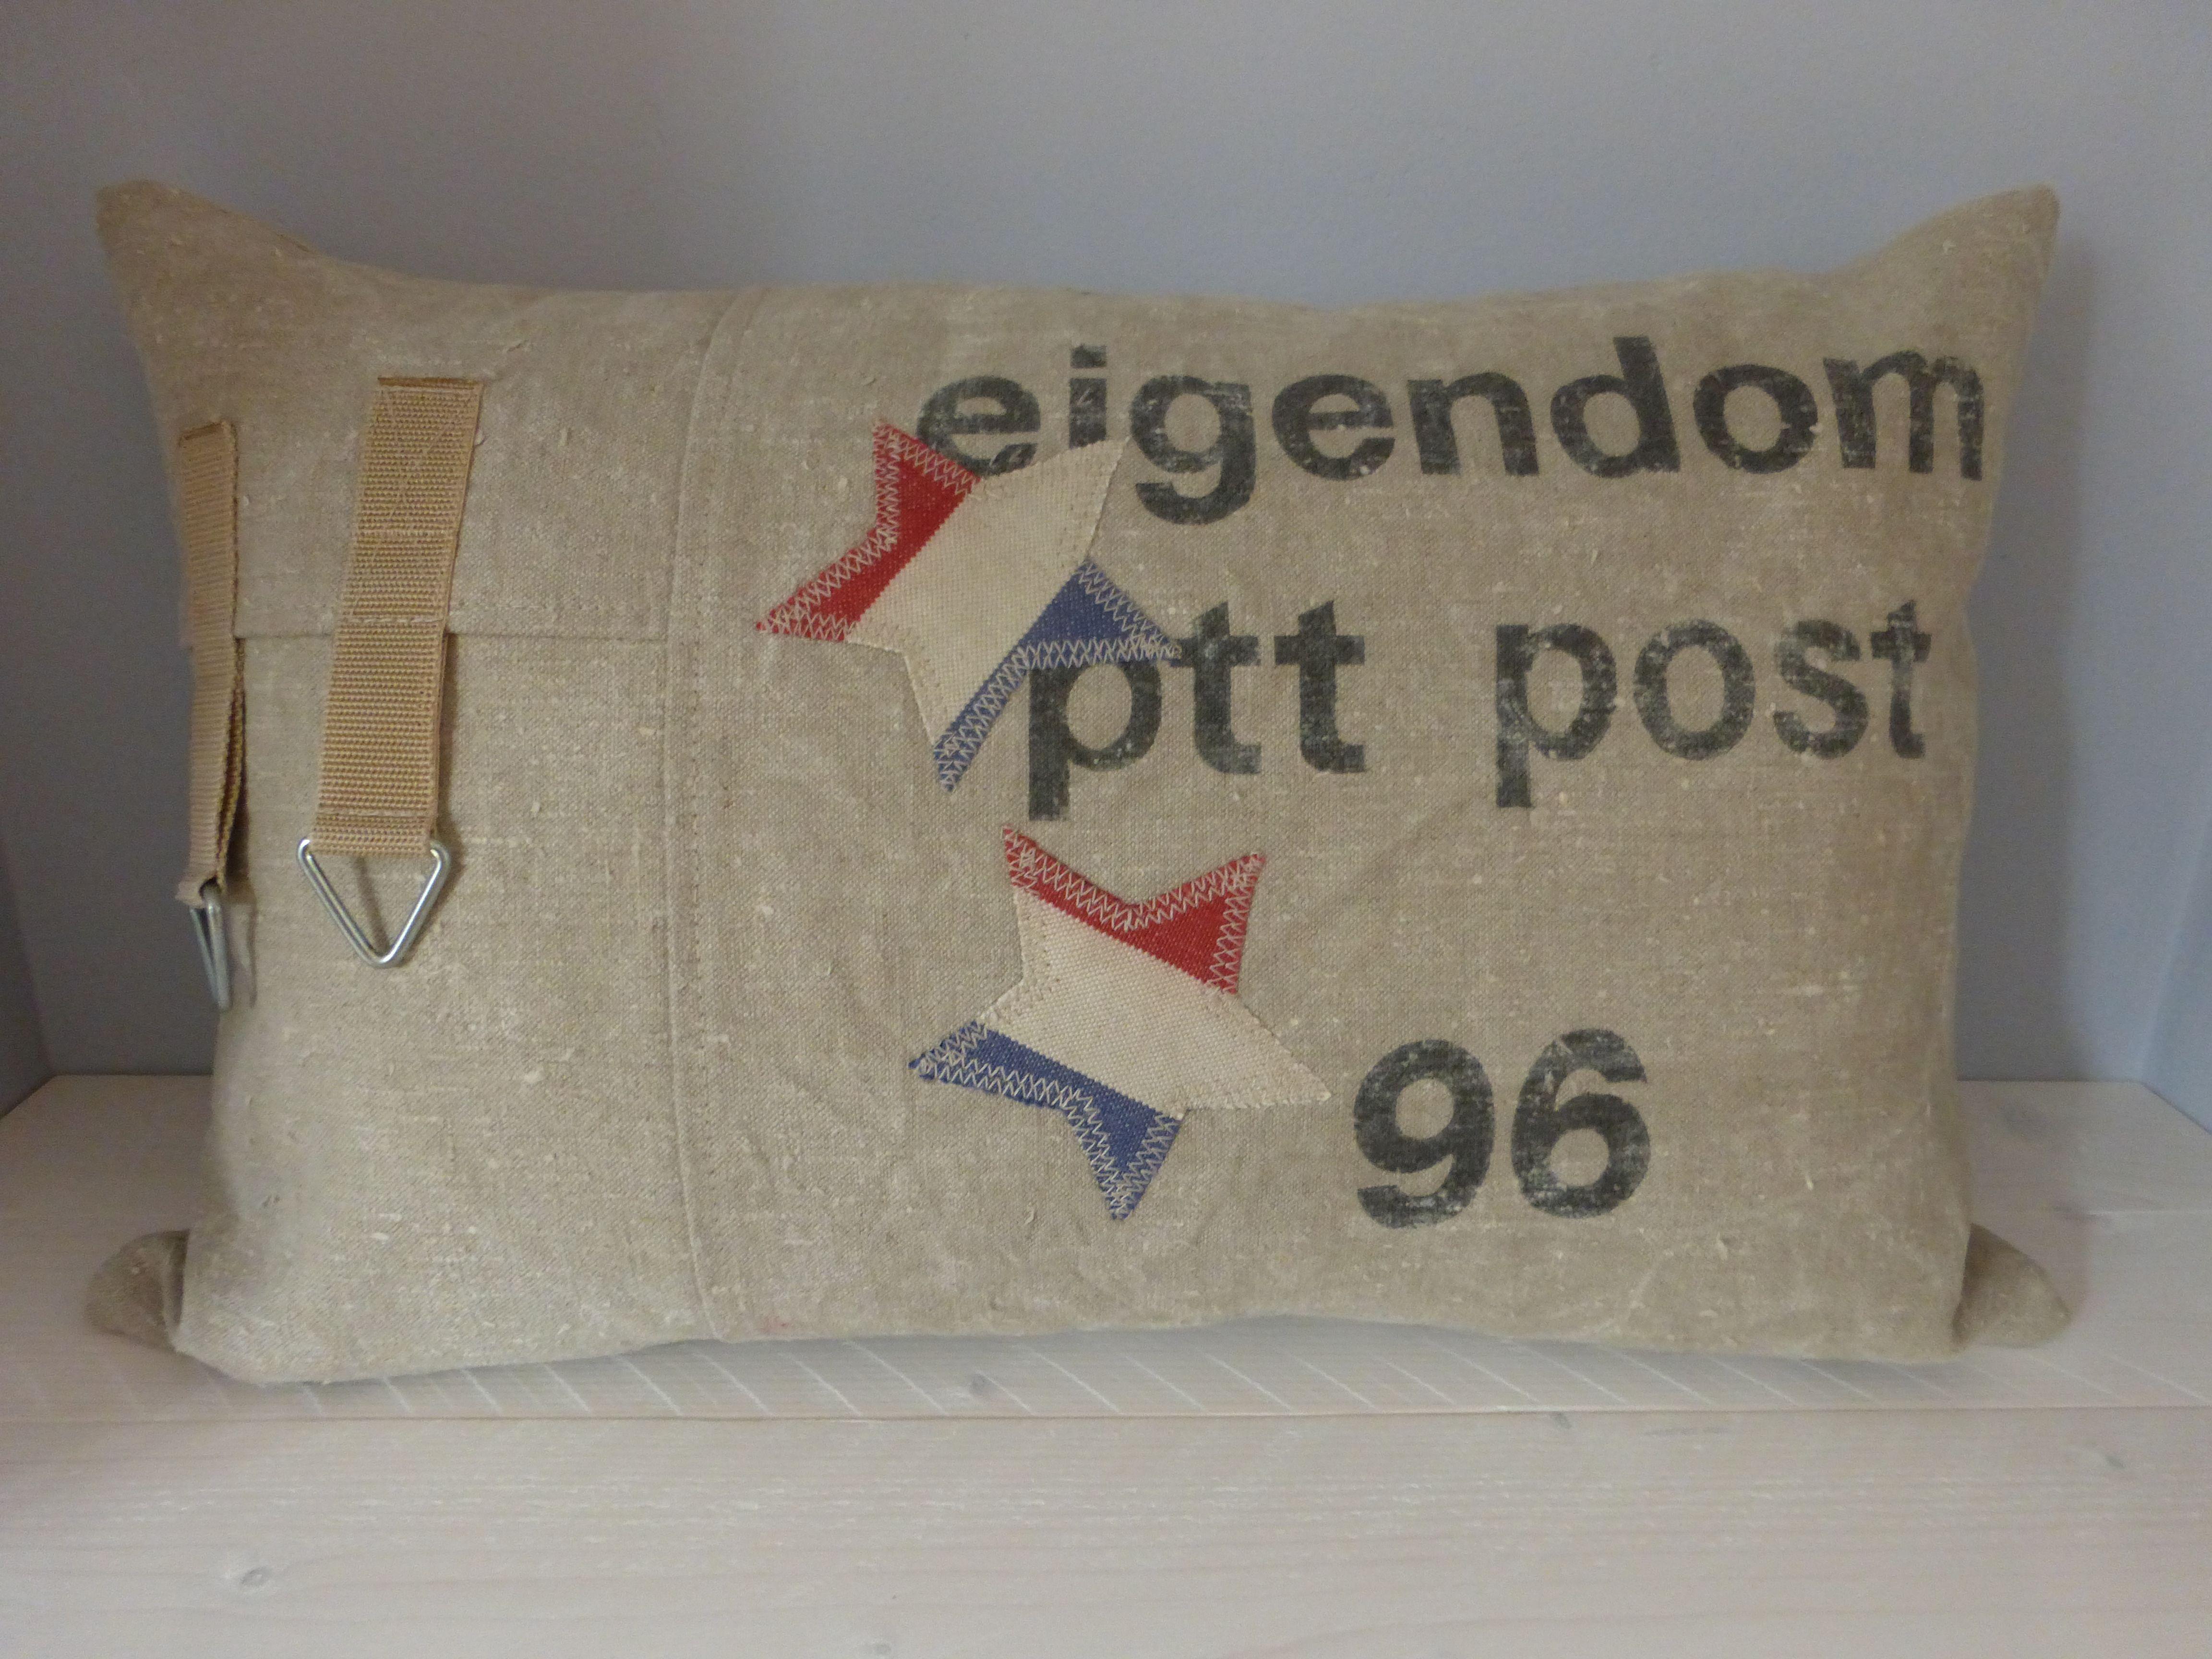 PTT Postzak kussen, gemaakt in opdracht.